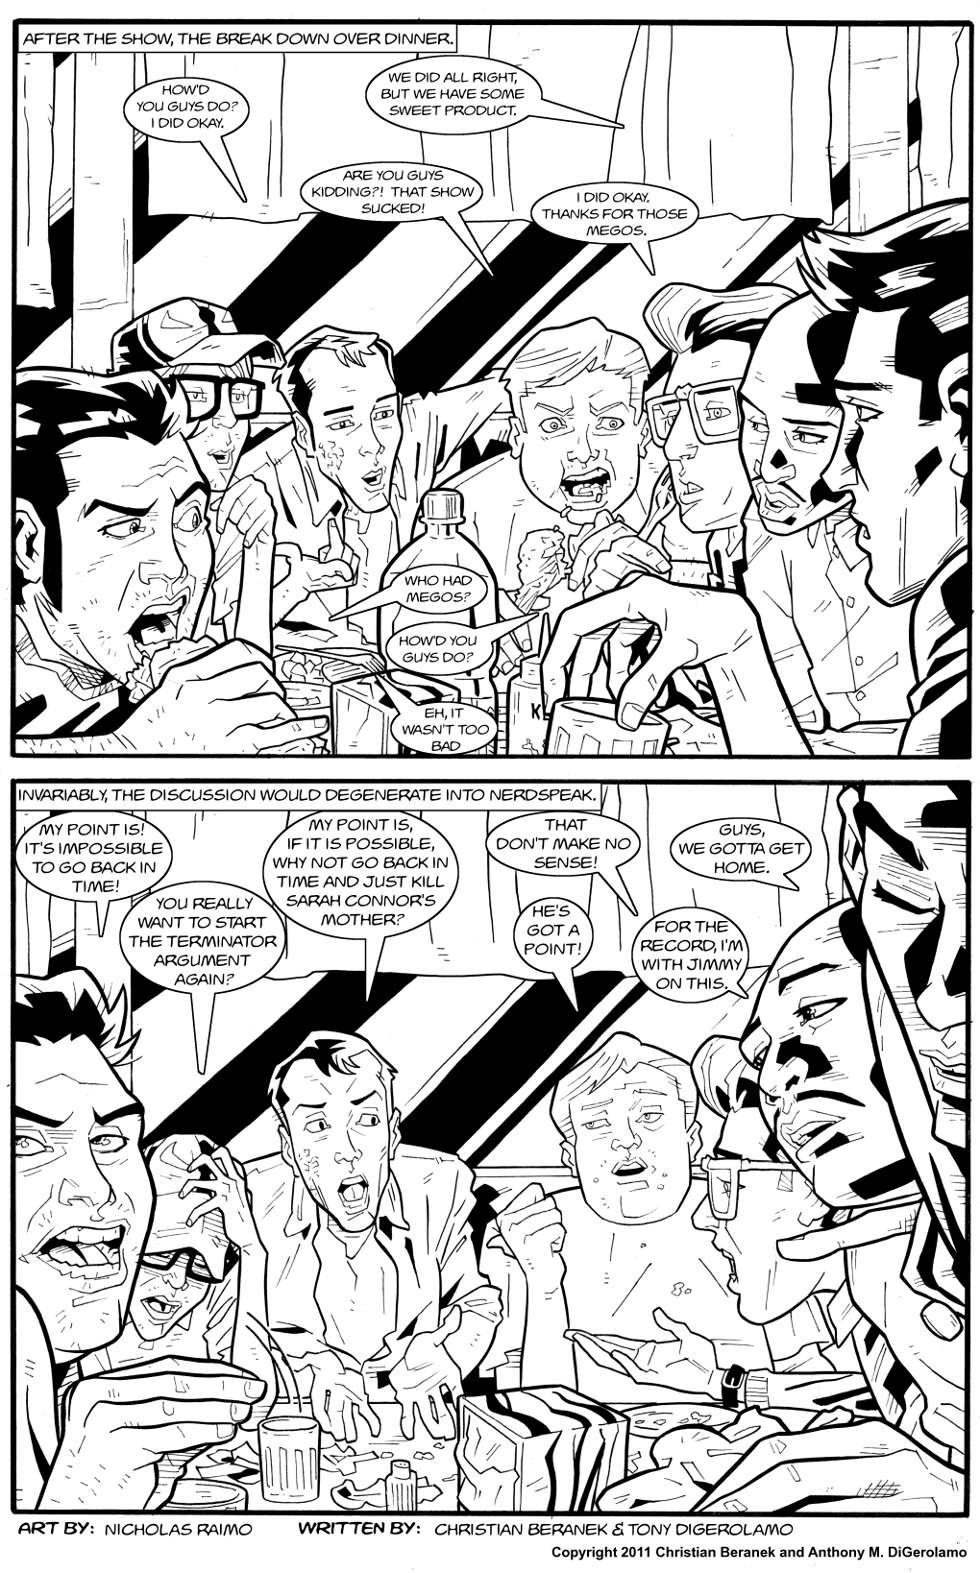 Dealers:  The Terminator Argument